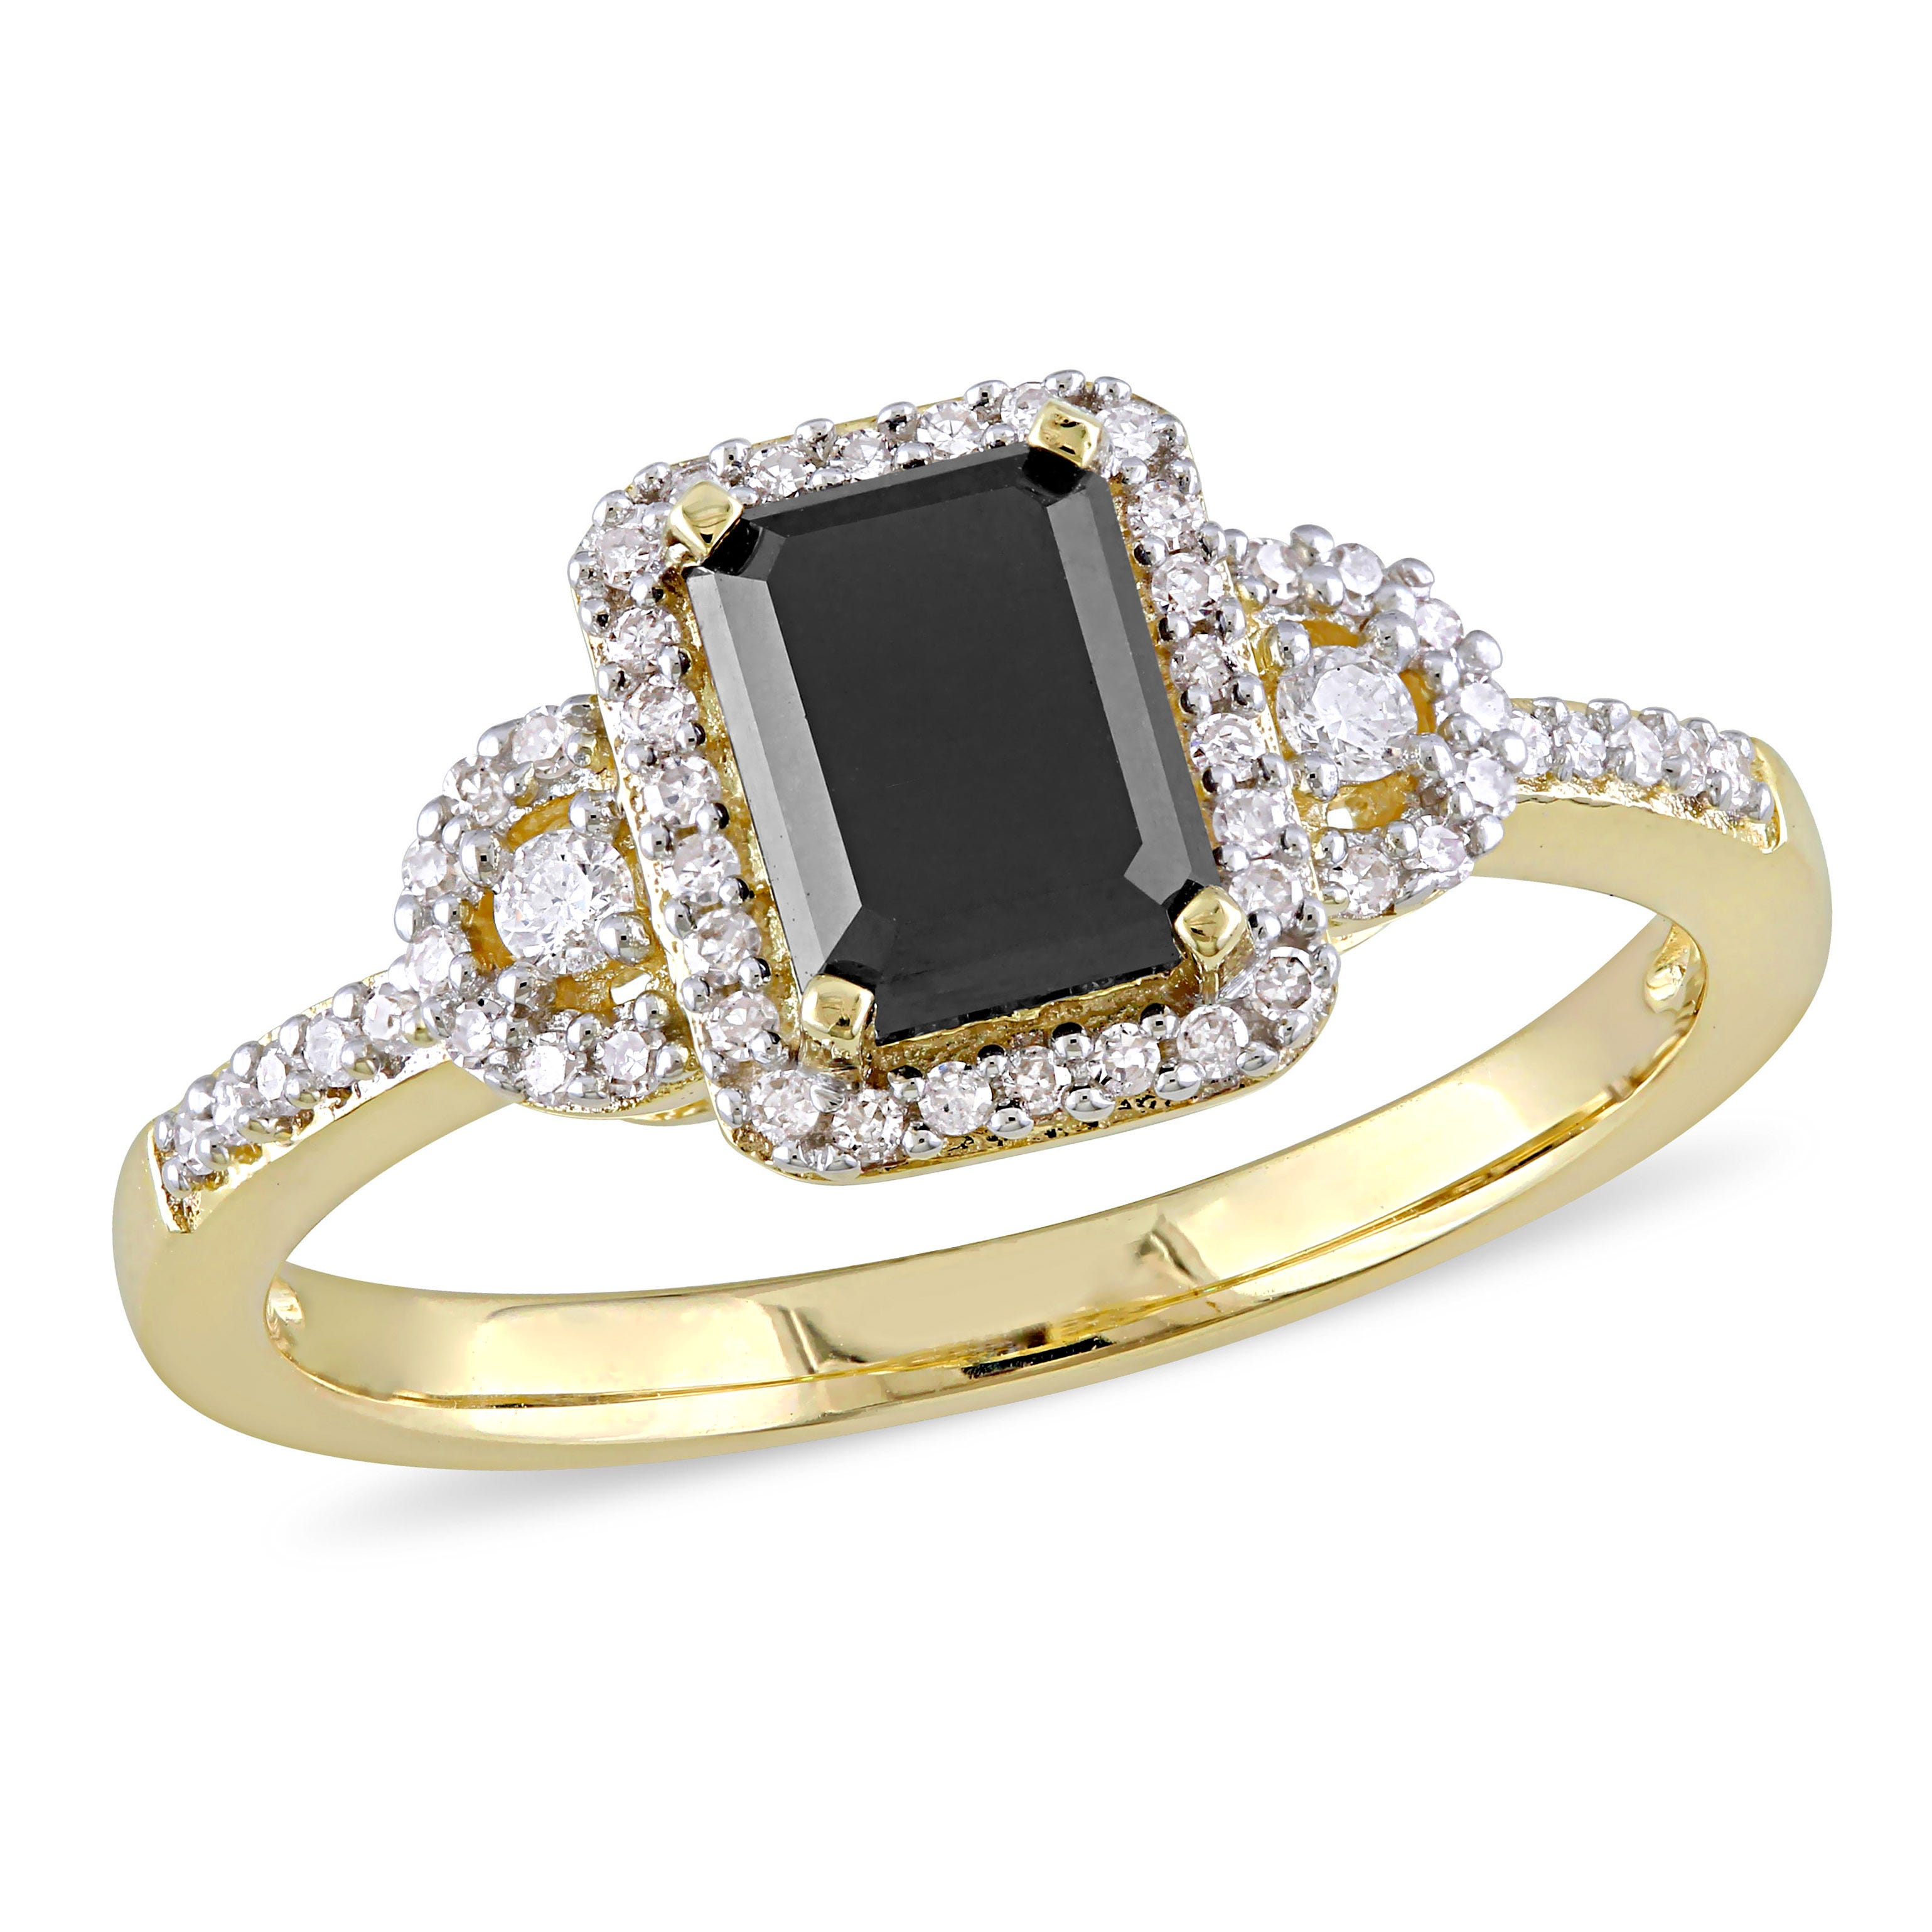 Black Emerald-Cut Diamond Halo 1.20ctw. Engagement Ring in Yellow Gold